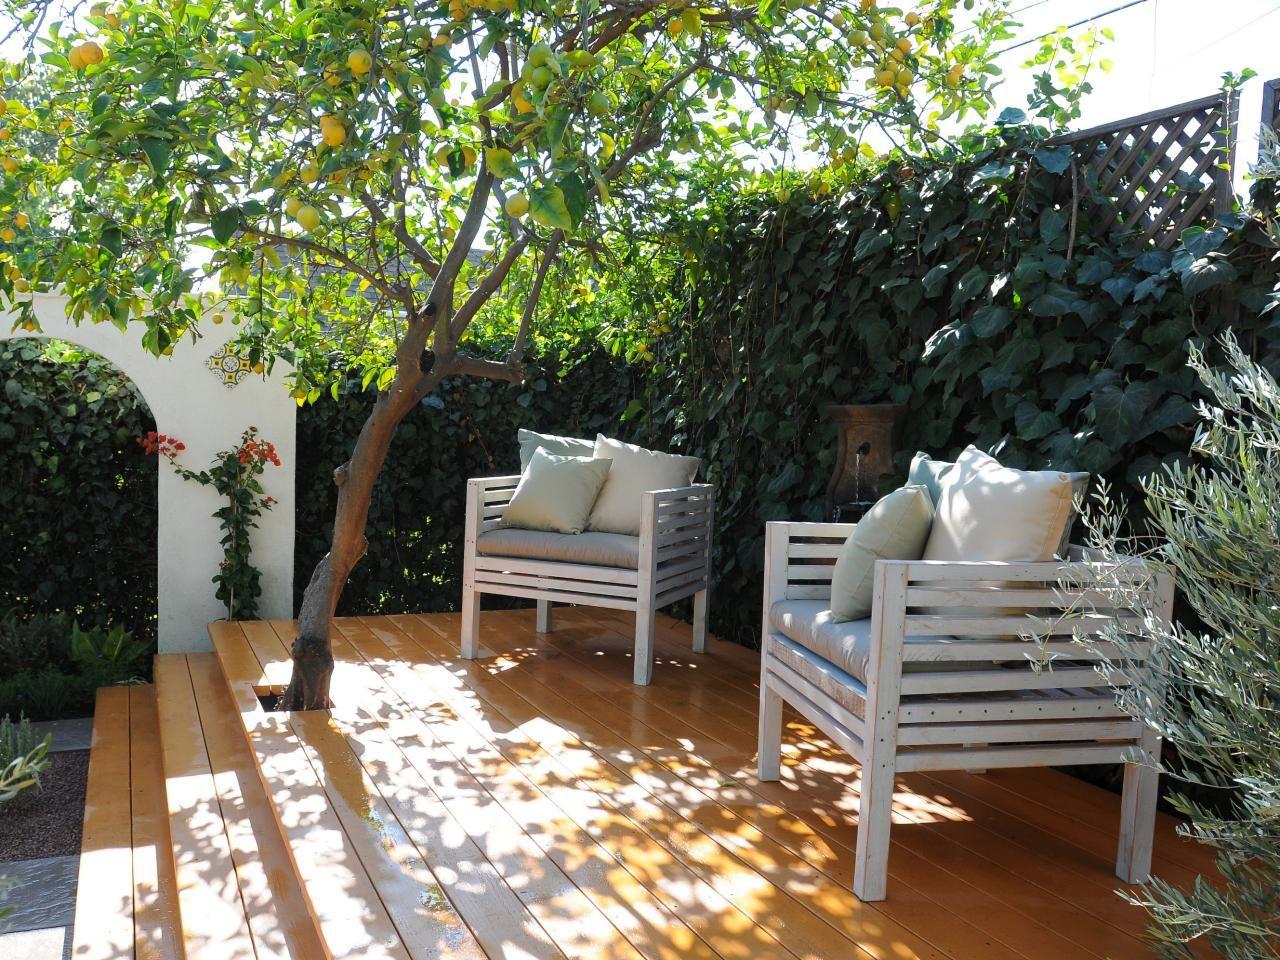 Make shade canopies pergolas gazebos and more shade canopy